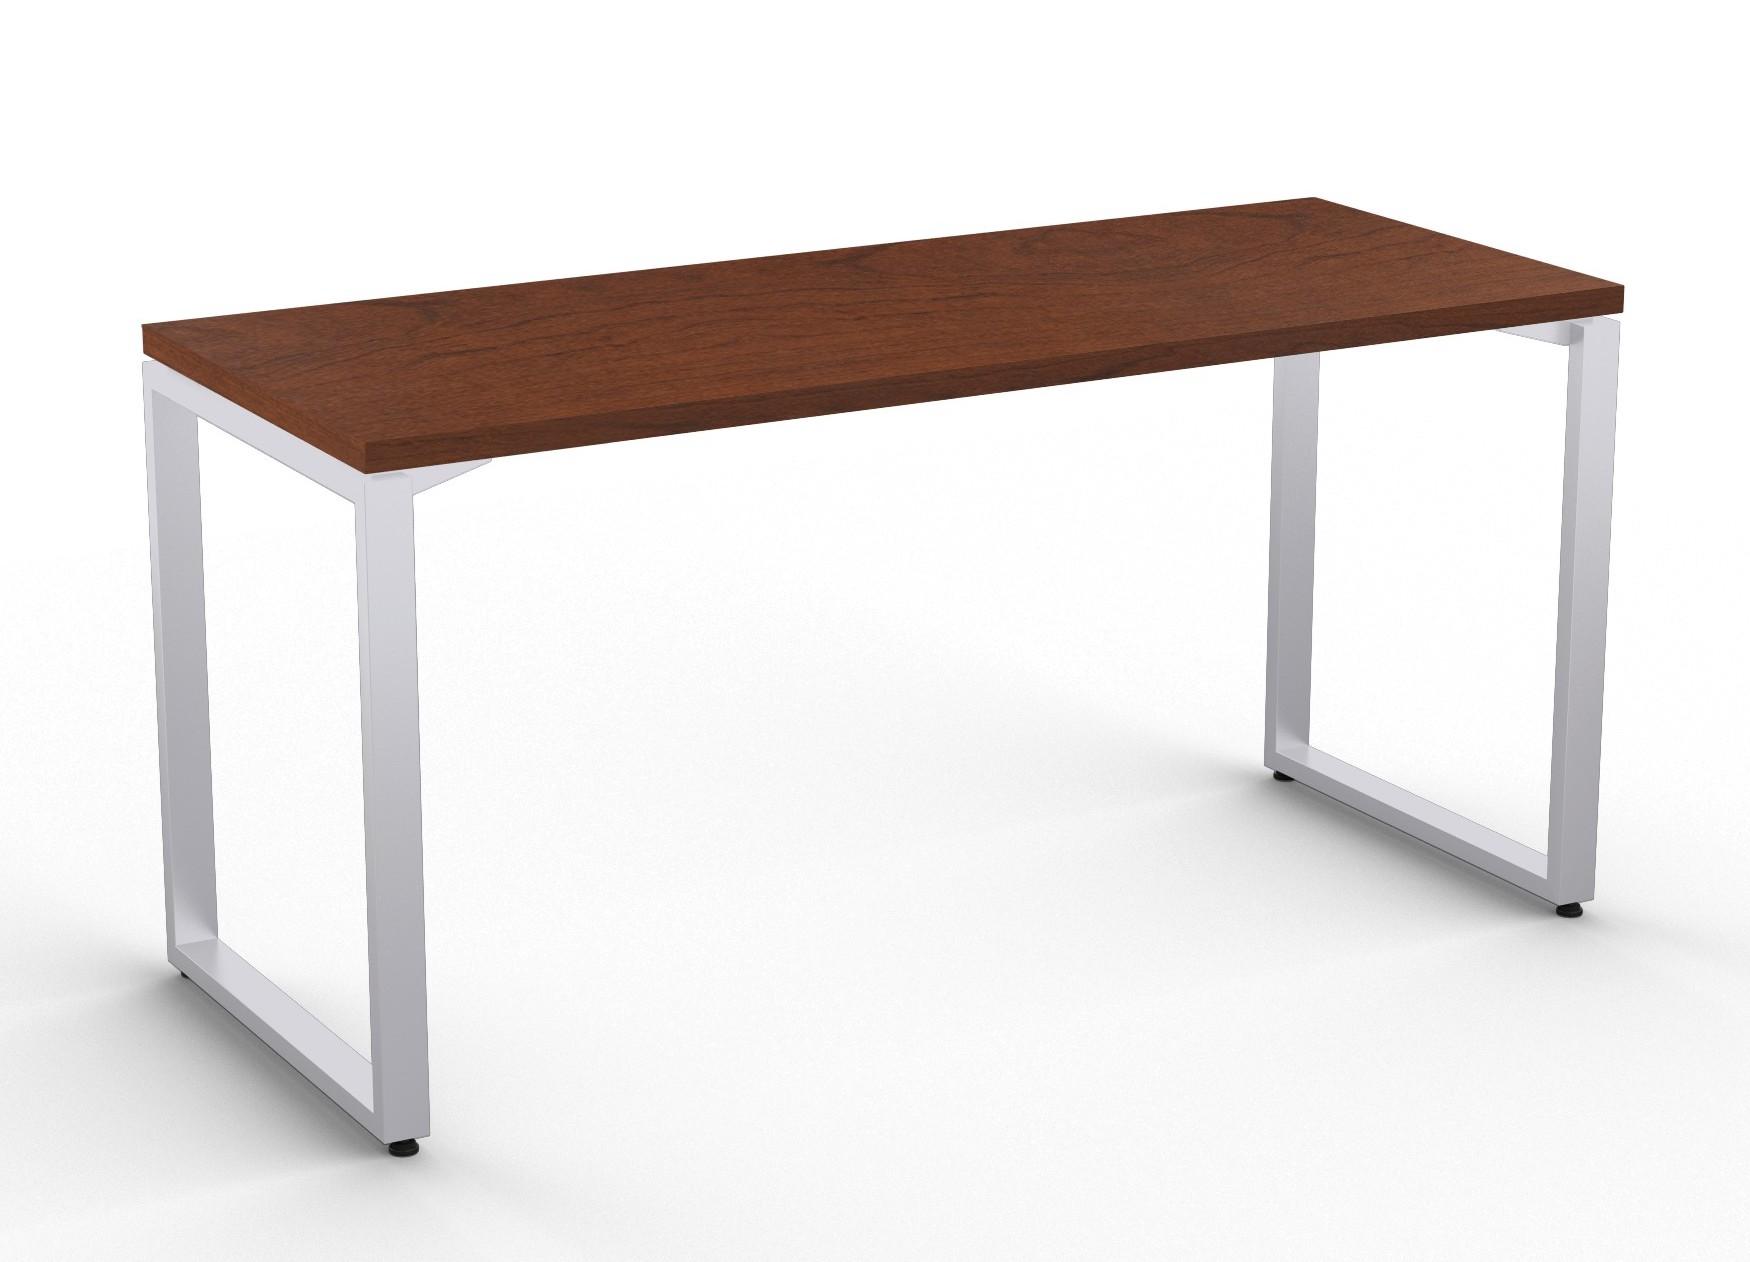 structure square leg table desk